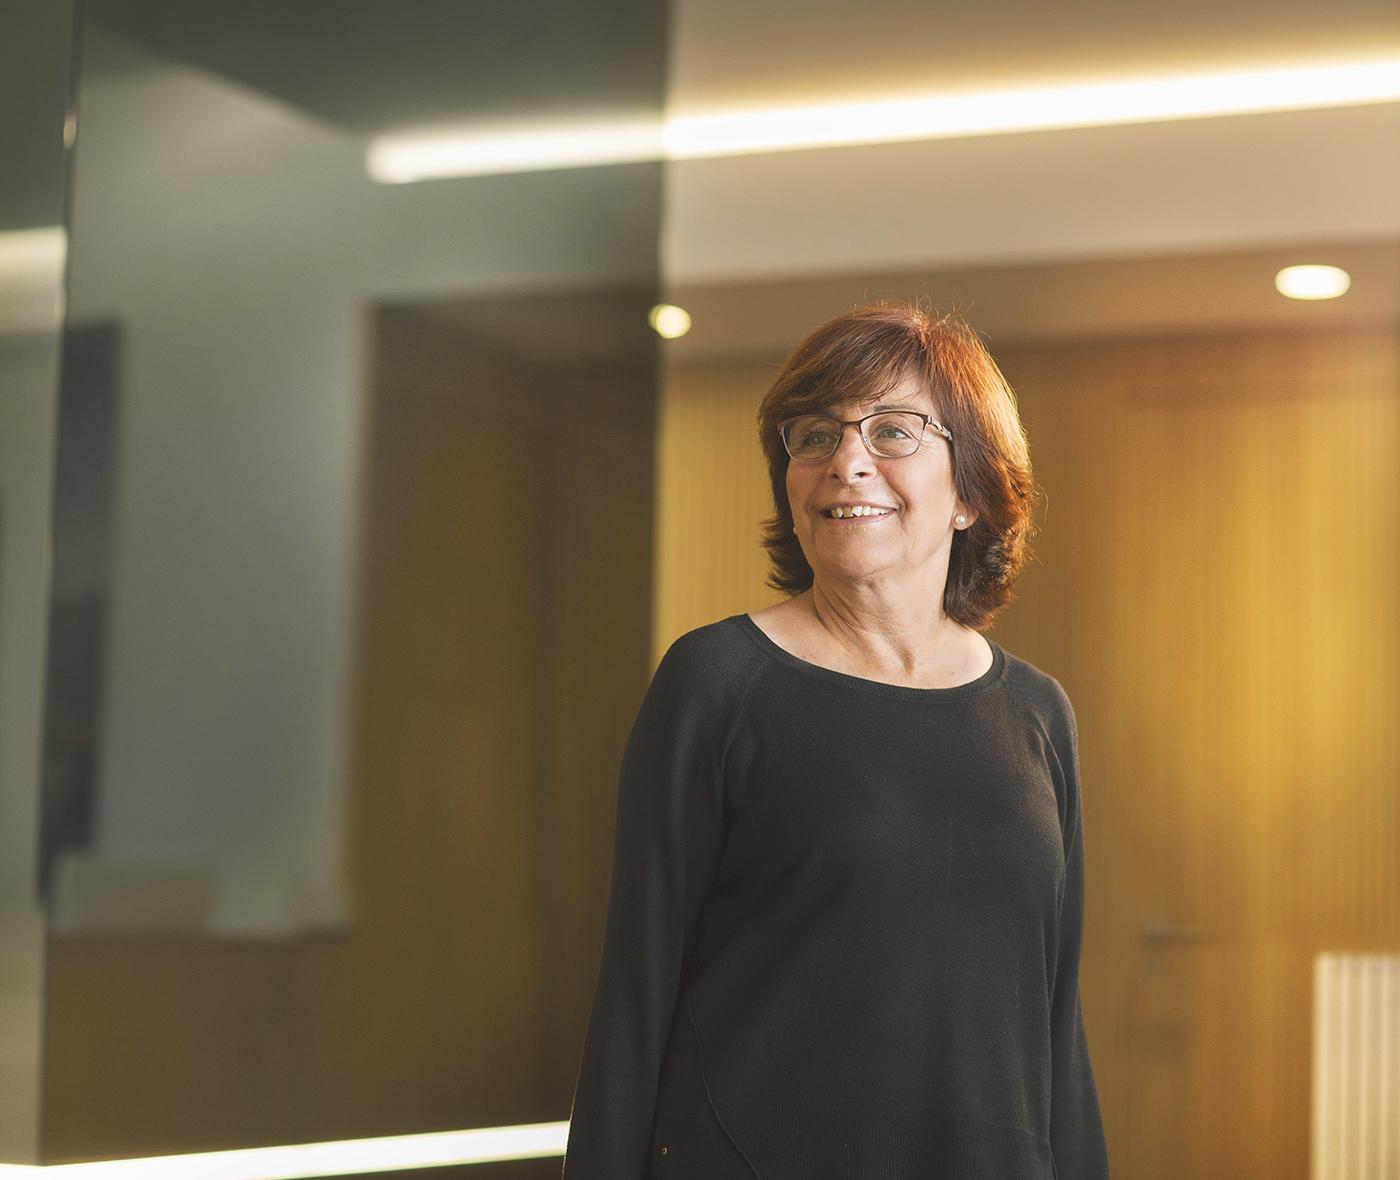 Ana Llopis - Arquitecto Socio - Gallardo Llopis